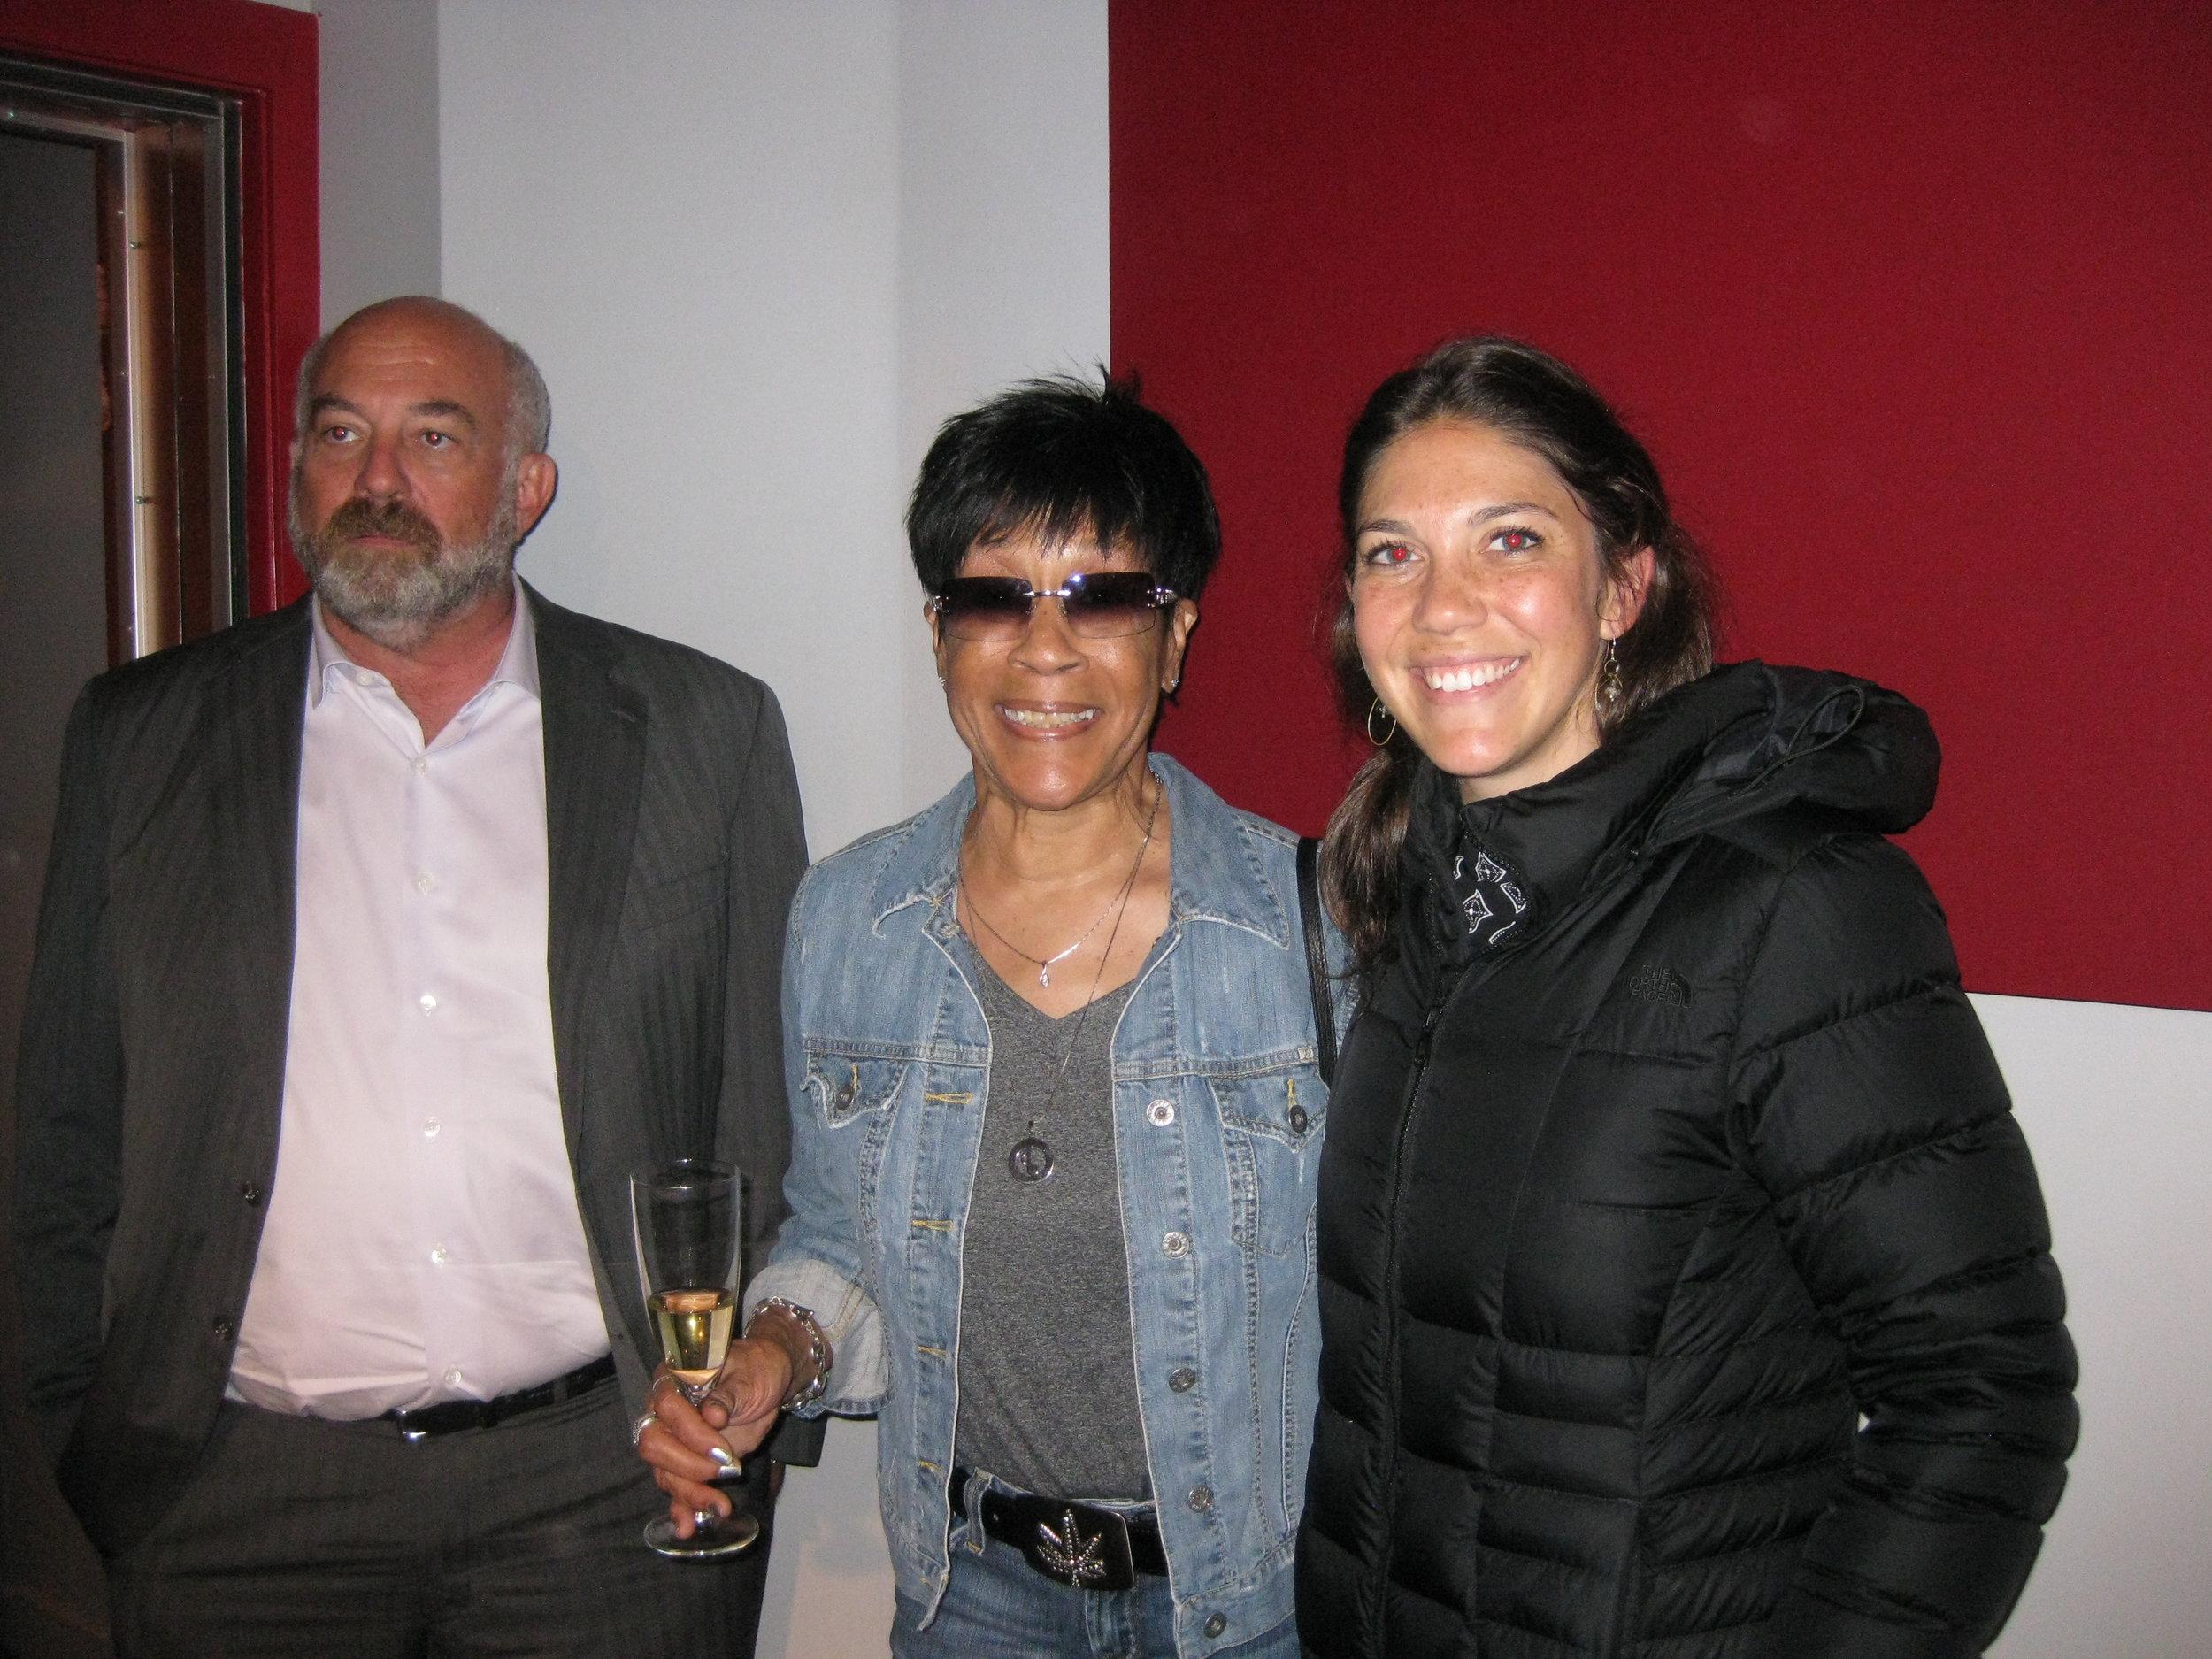 Tom Siering, Bettye Lavette, A. McDaniel; NYC